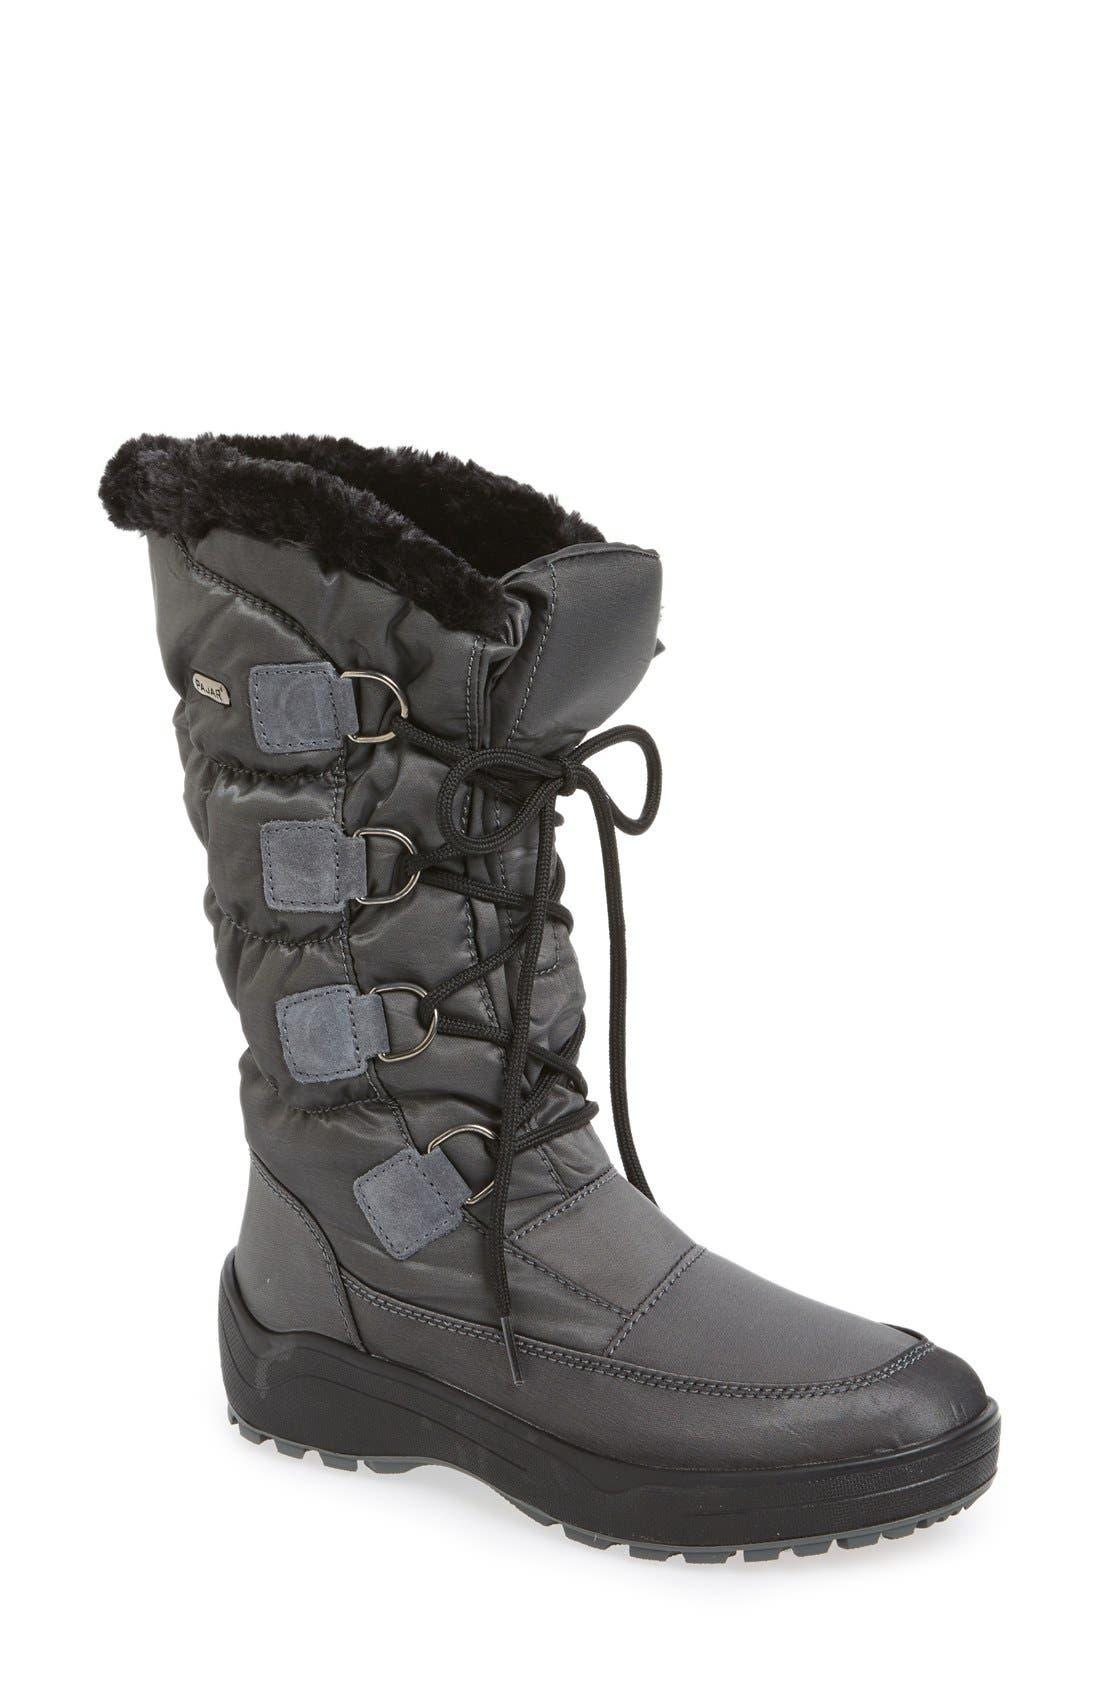 Pajar Women's 'Riga' Waterproof Ice Grippers Boot SDy6uX5ha